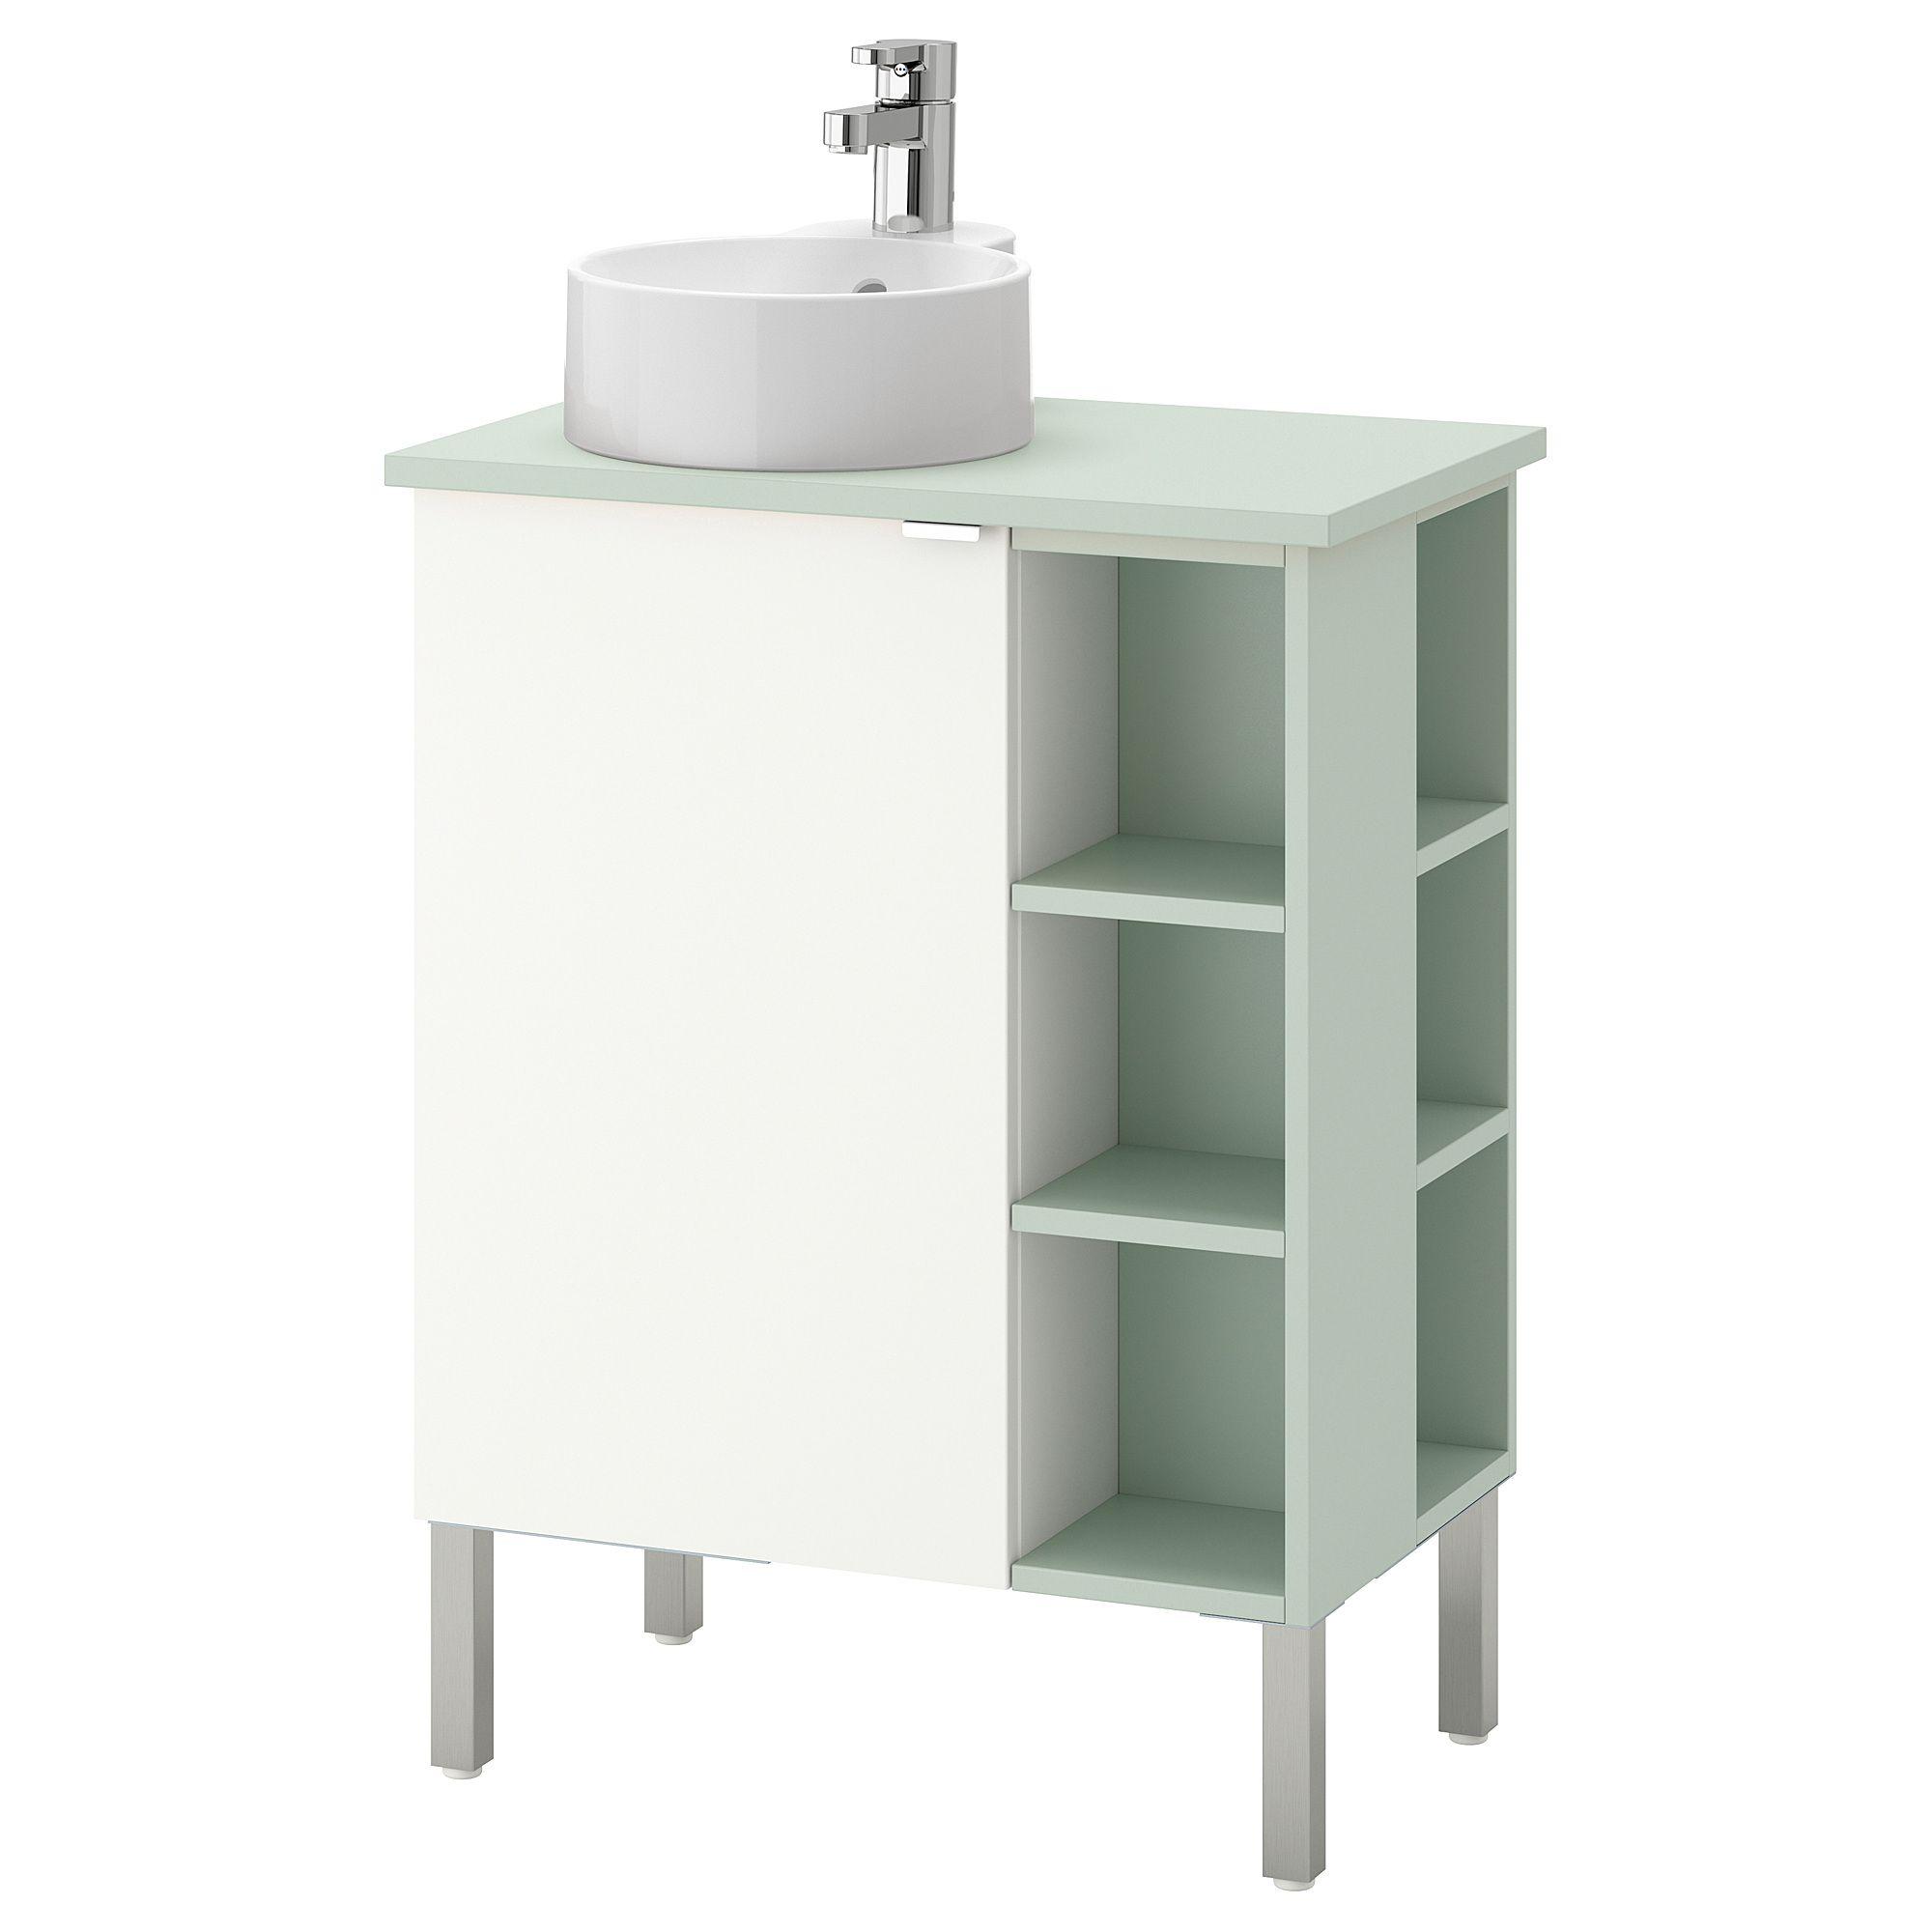 Lillangen Viskan Gutviken Sink Cabinet 1 Door 2 End Units White